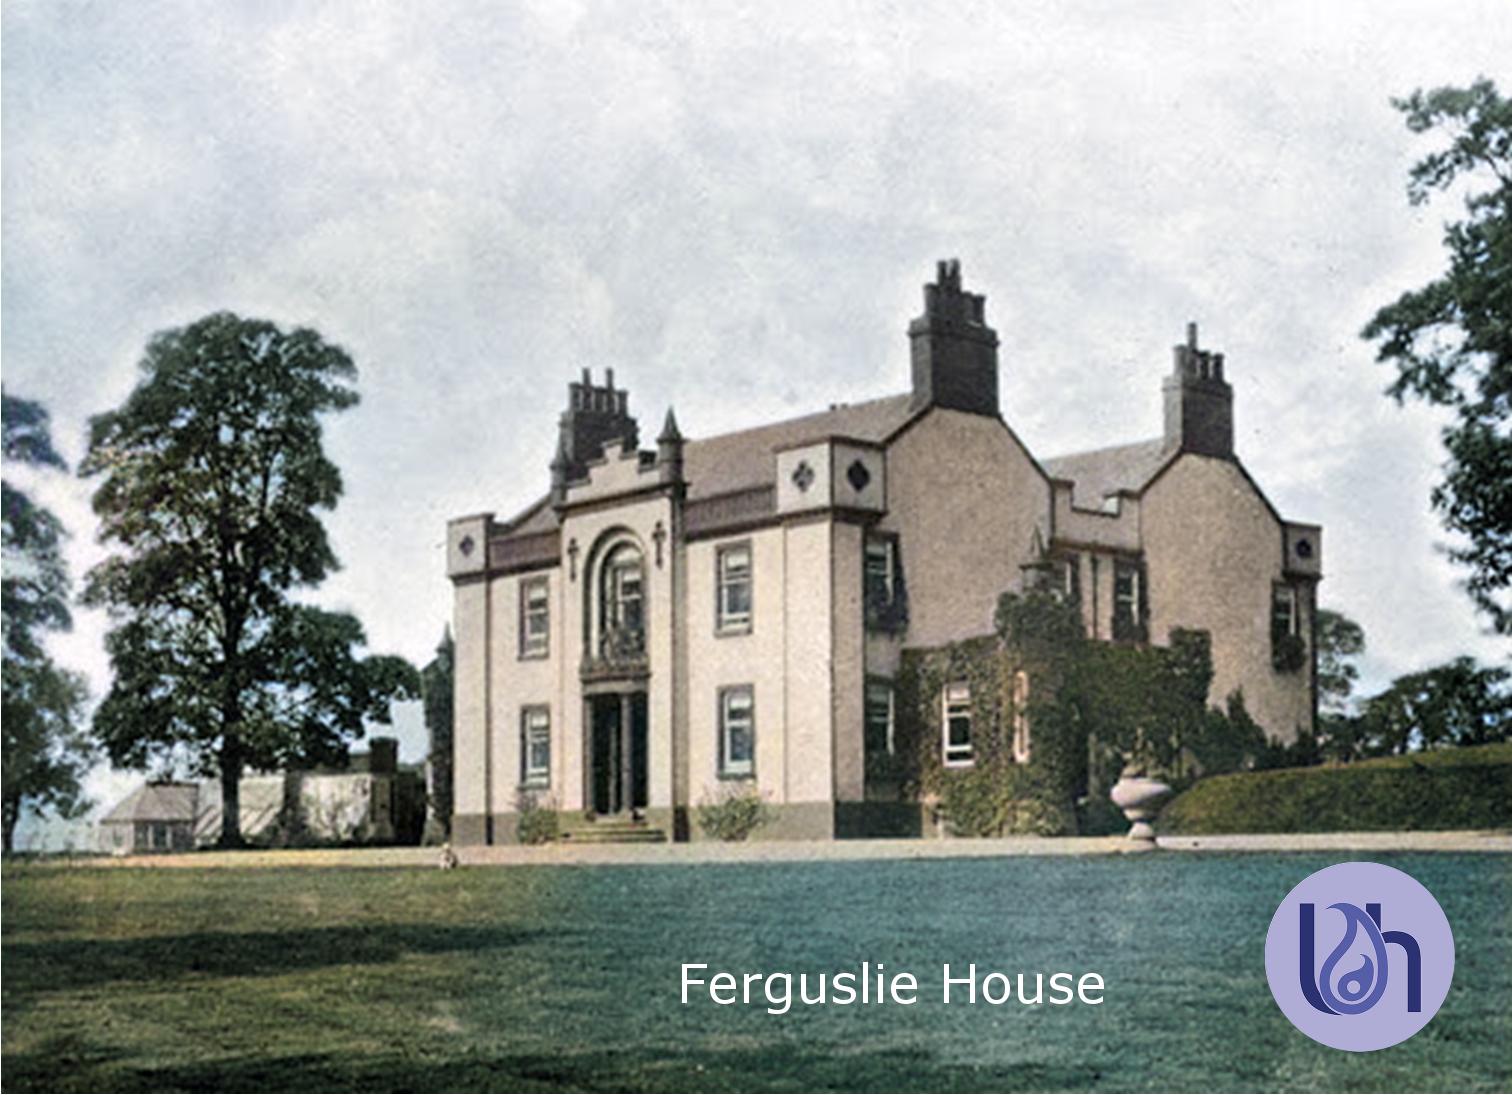 Ferguslie – A brief history of the medieval estate